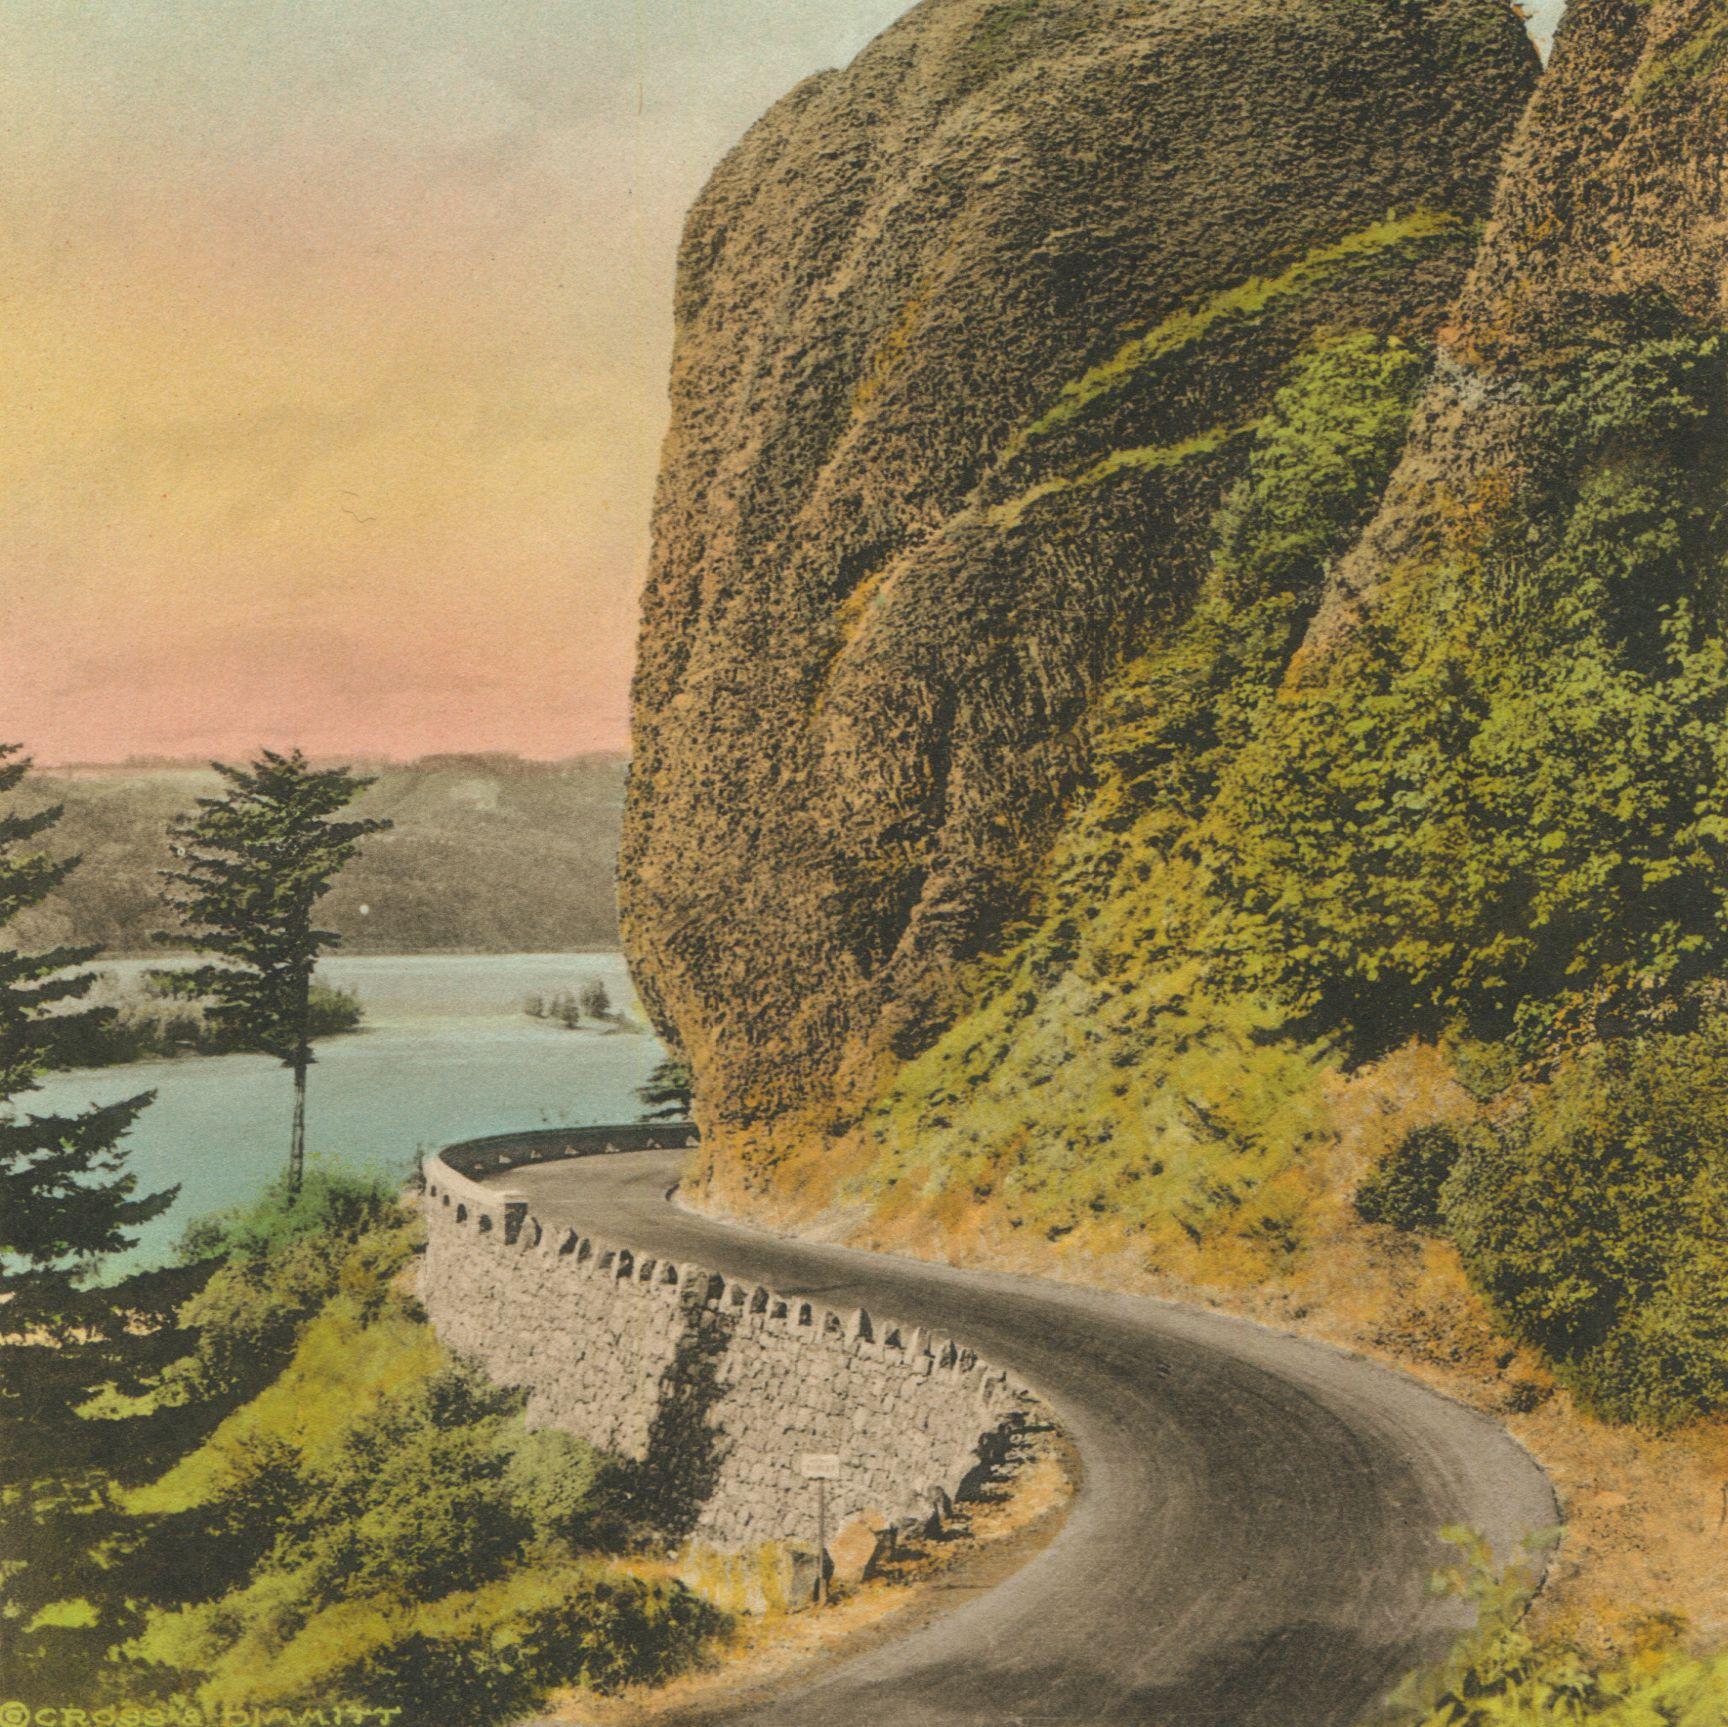 Pomo 0616 mudroom gorge highway vintage 2 va0sqb